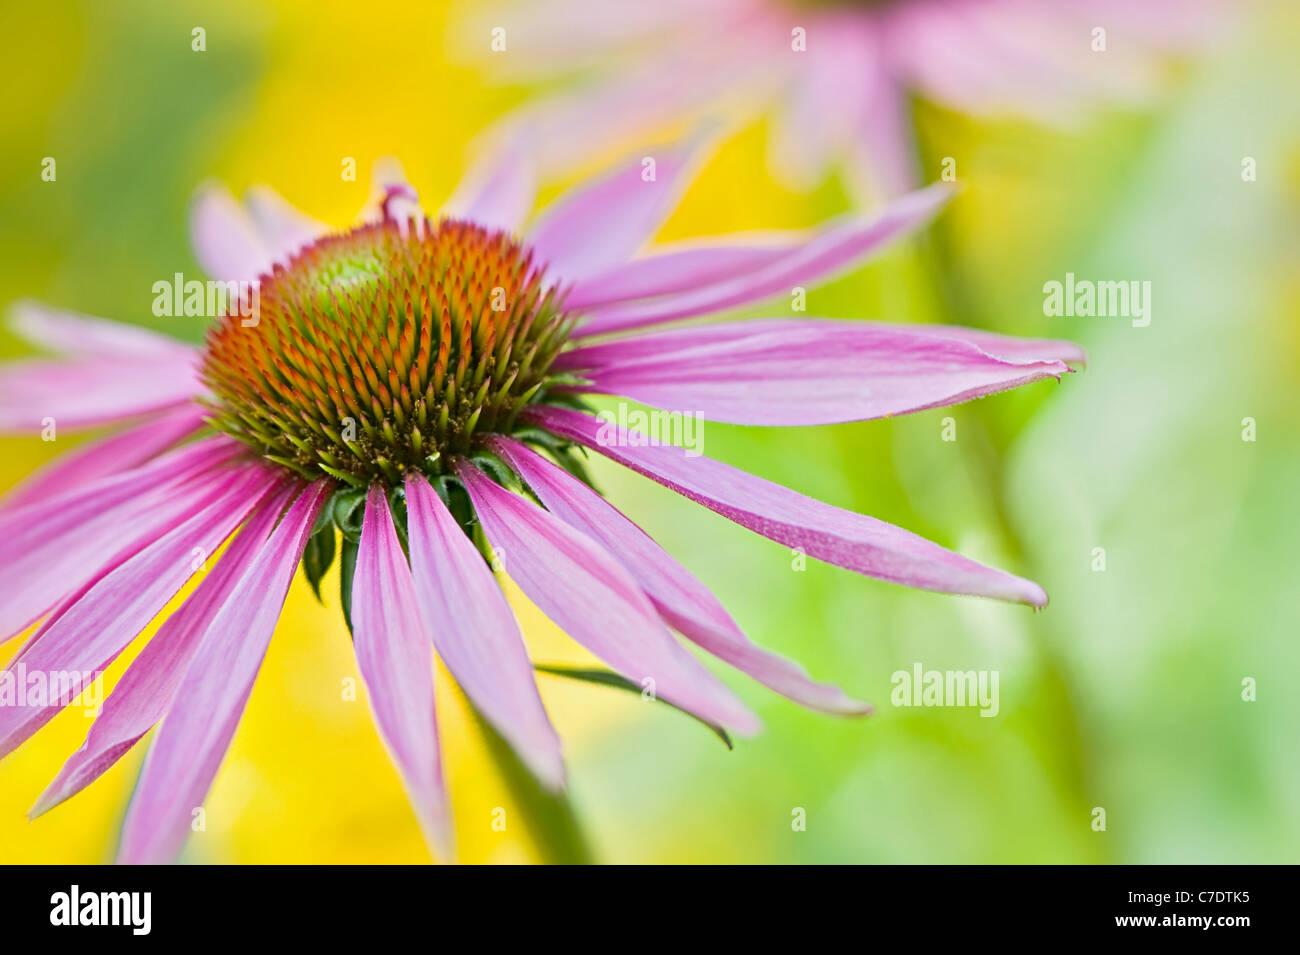 Echinacea purpurea Eastern purple cone flowers or Purple coneflower - Stock Image